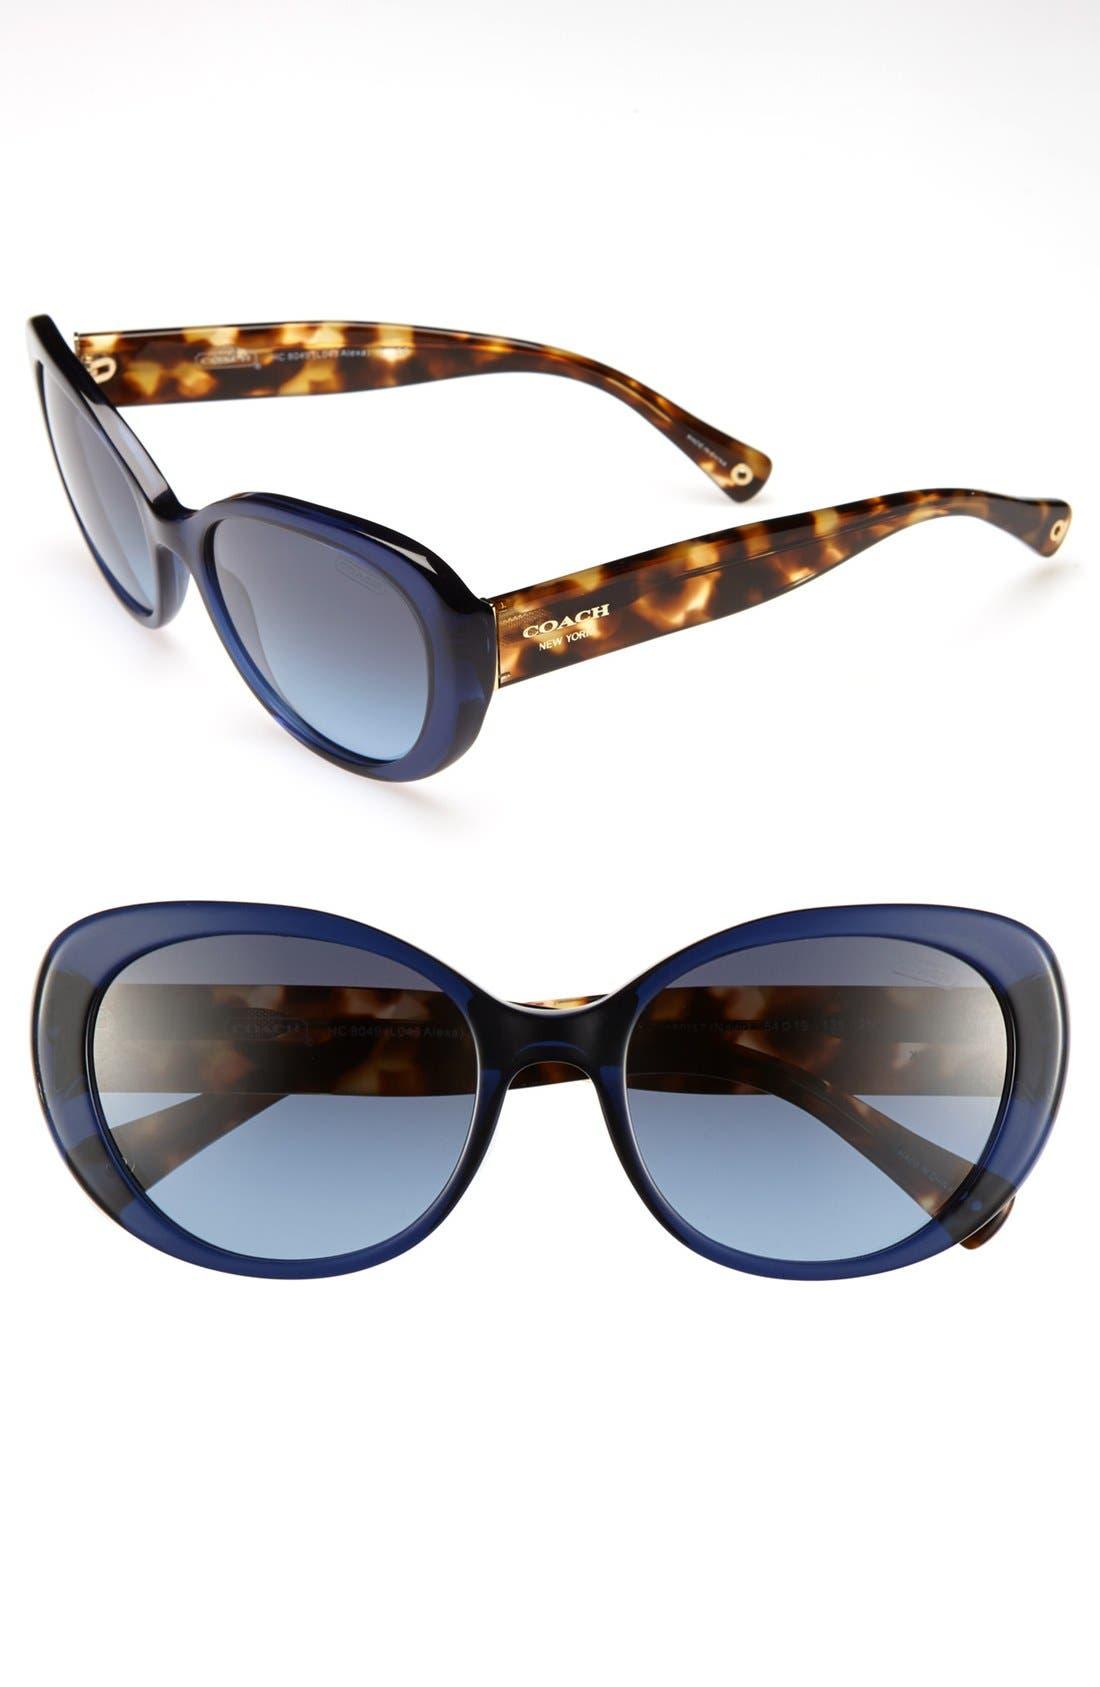 Alternate Image 1 Selected - COACH 'Alexa' 54mm Sunglasses